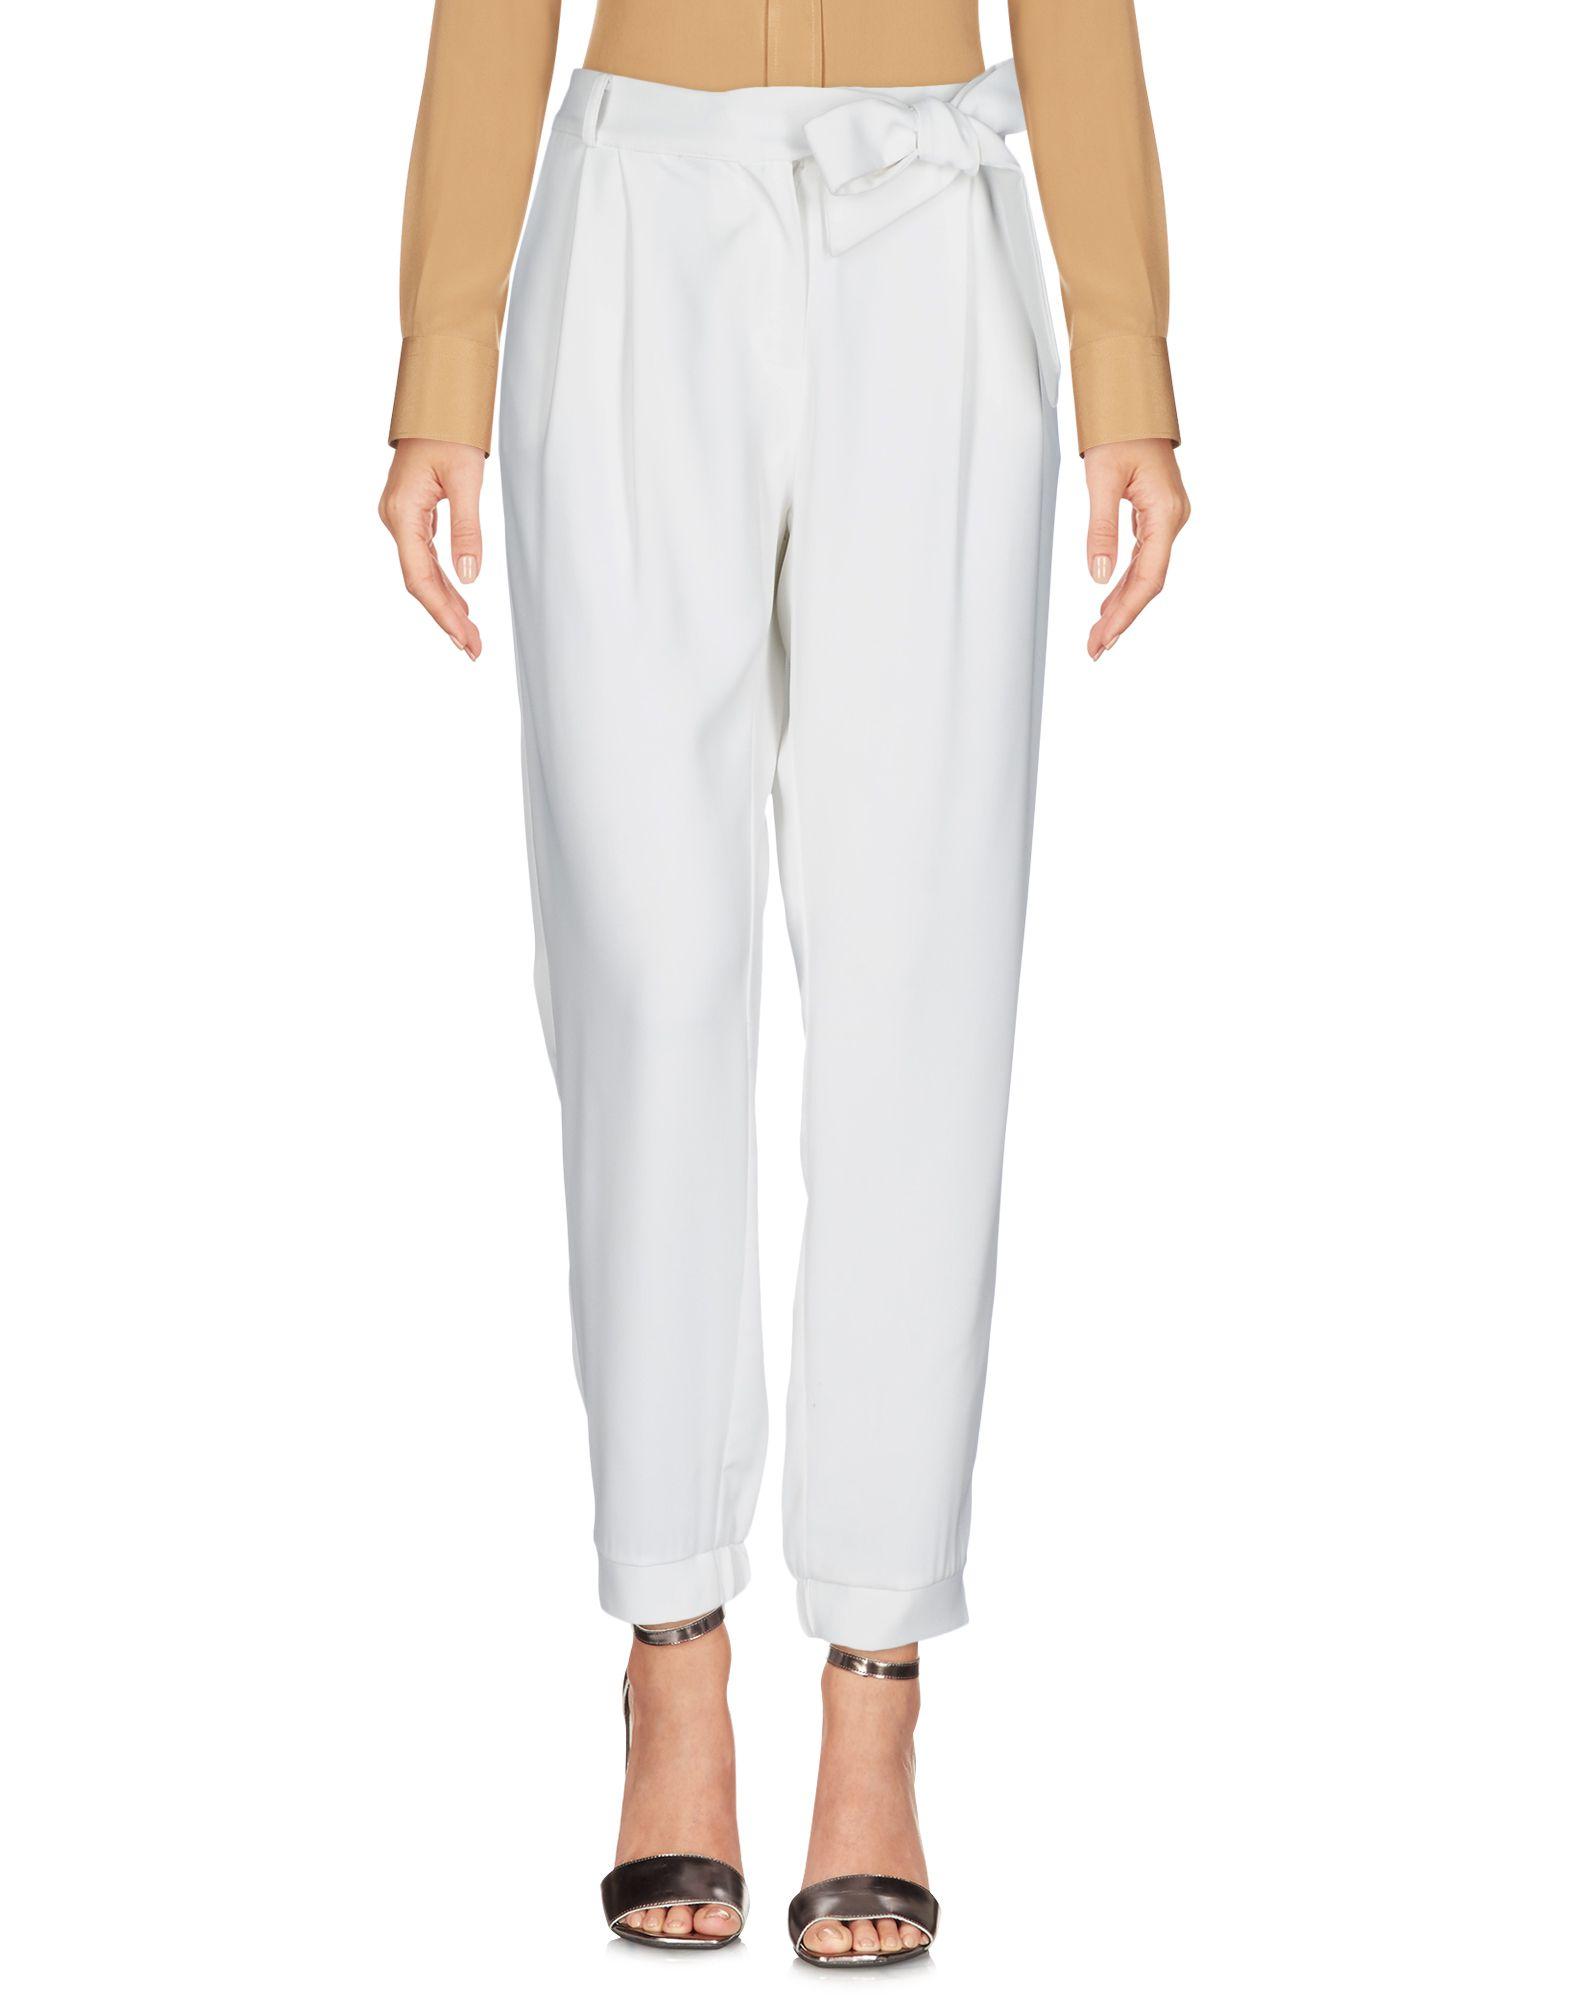 Pantalone Parker Donna - Acquista online su mFuh4DwxuY